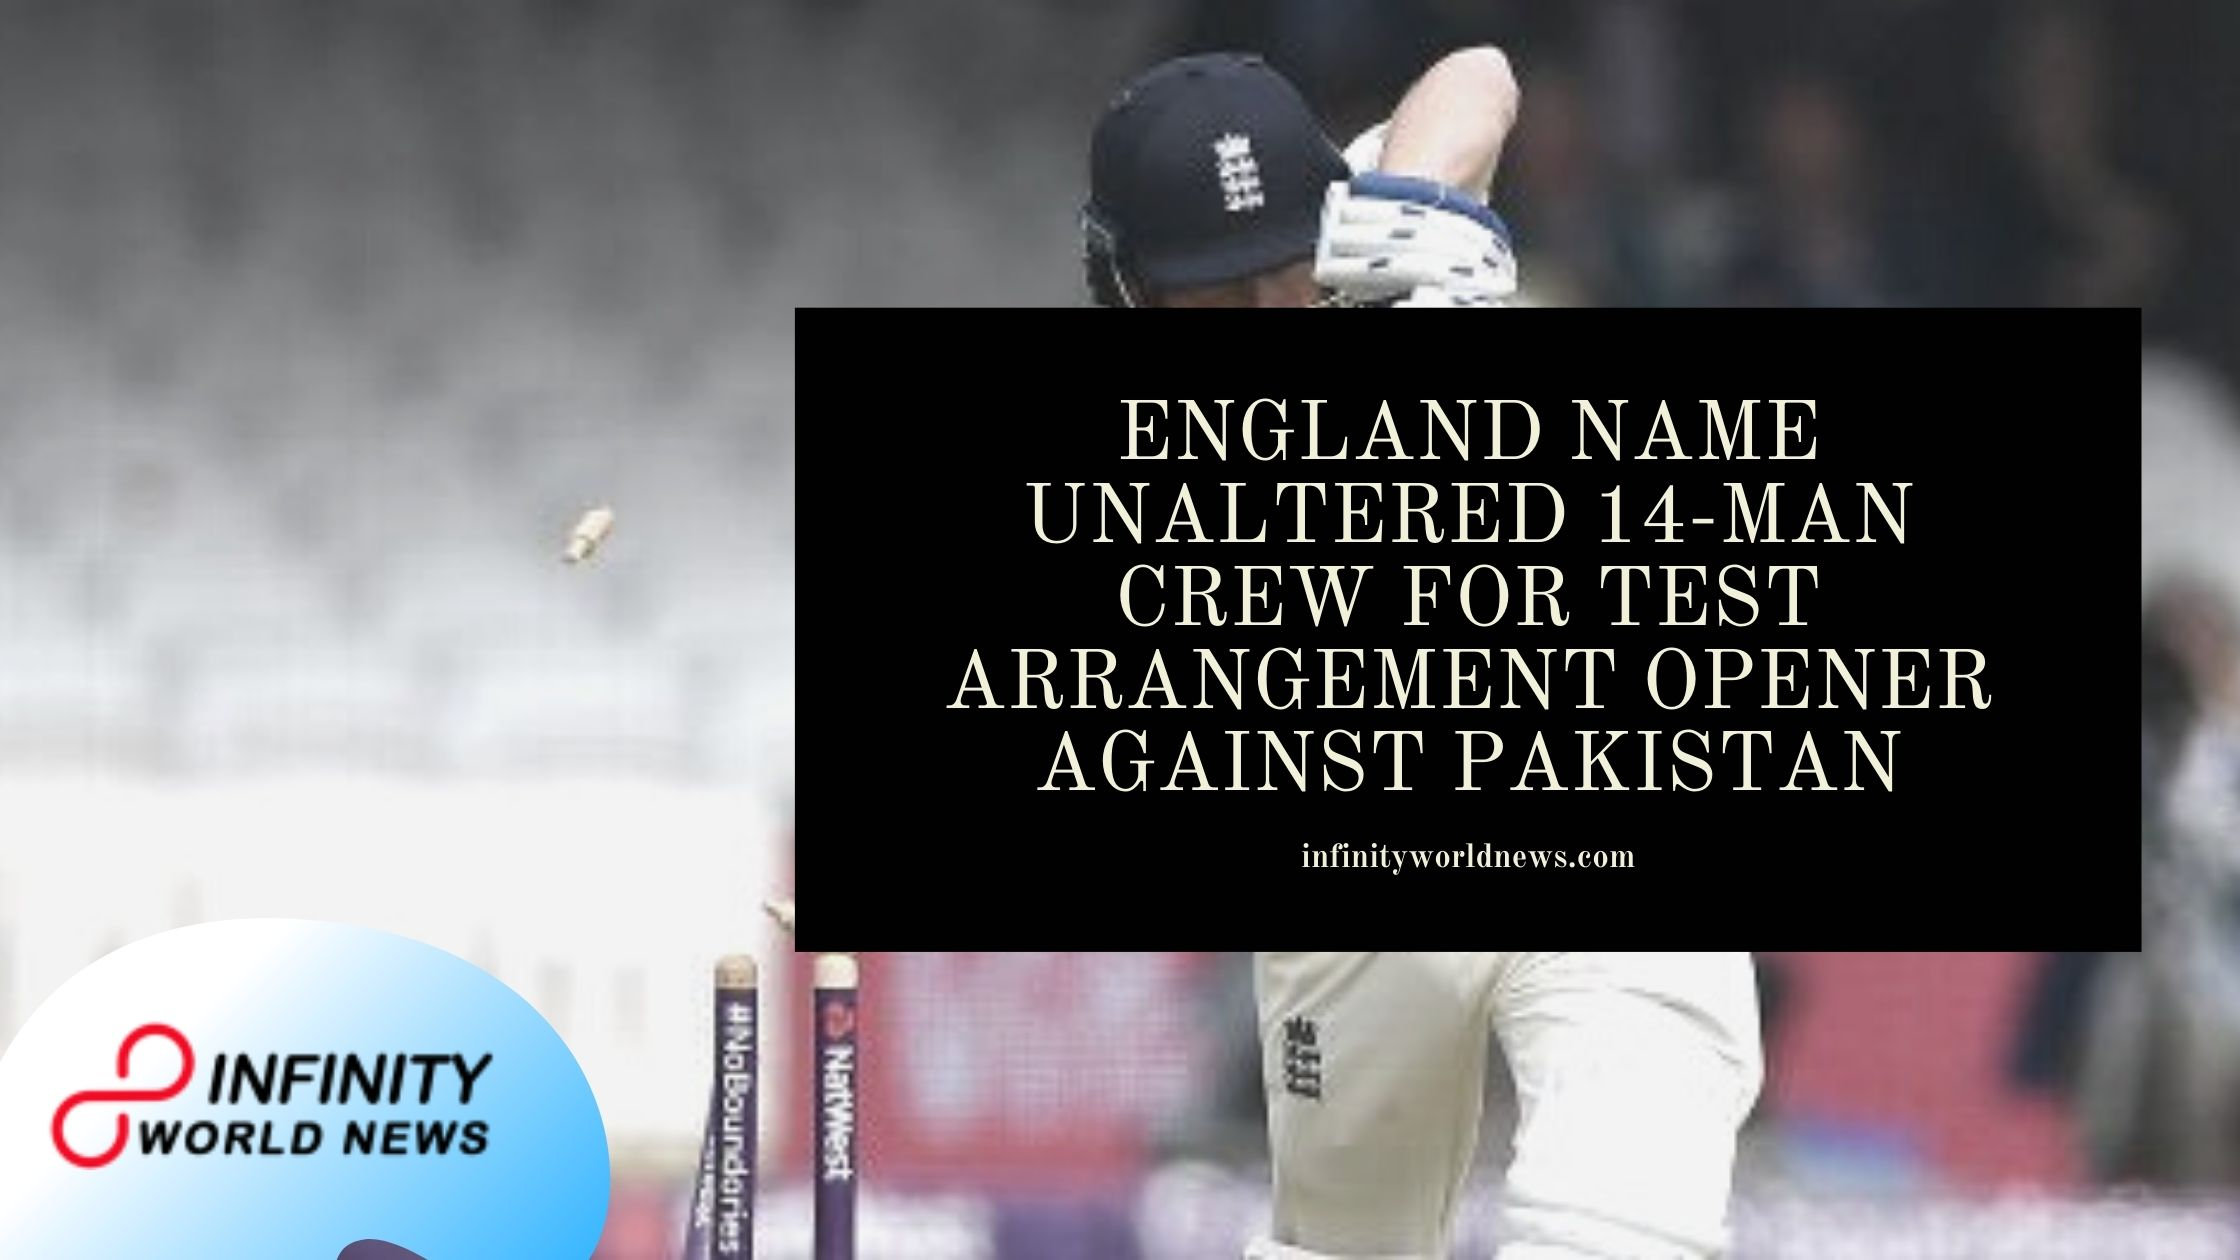 England name unaltered 14-man crew for Test arrangement opener against Pakistan